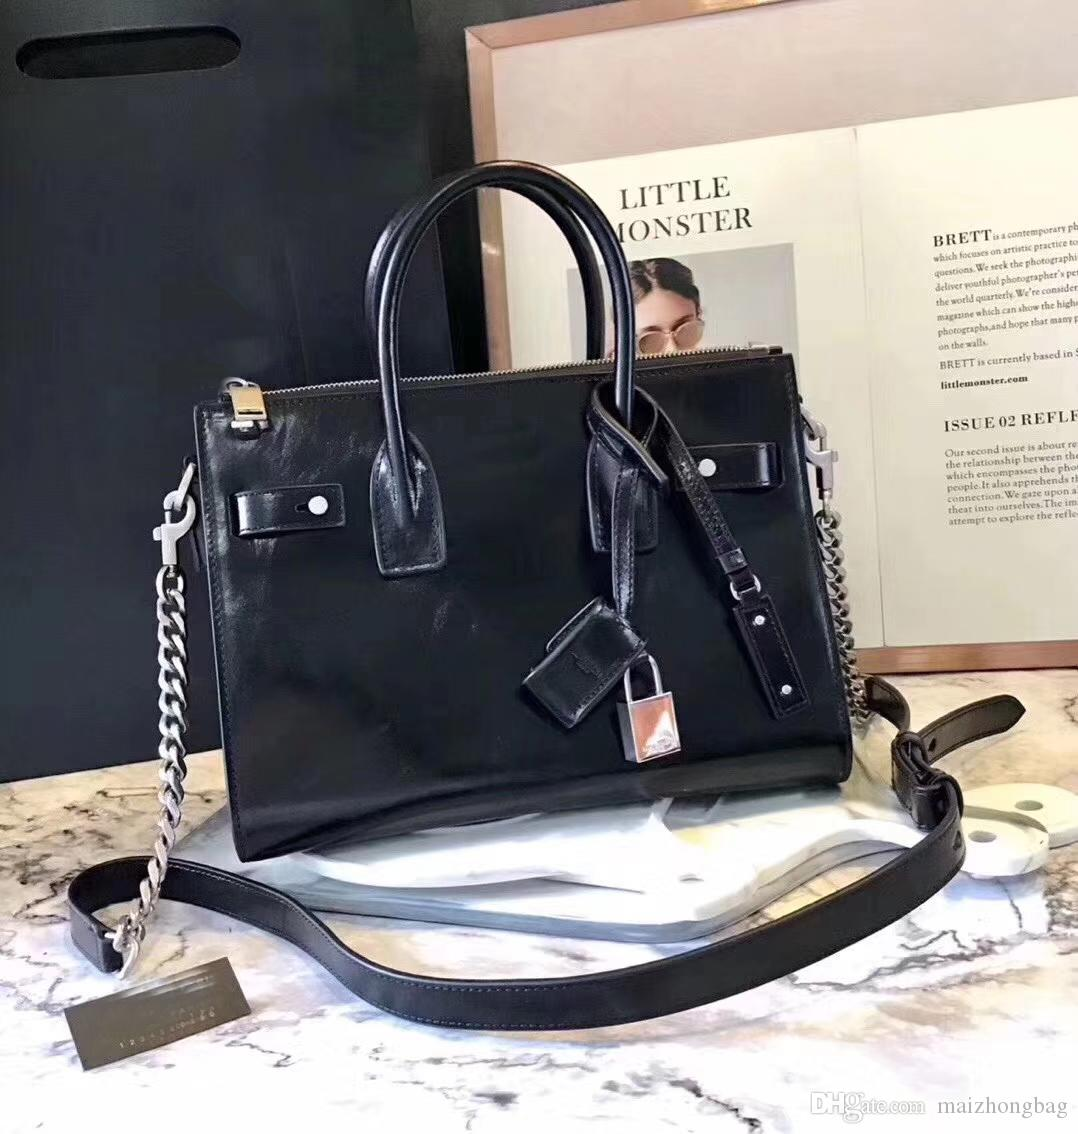 7e3f80e550 Women Famous Brand Designer Bags Genuine Leather Good Quality Metal  Messenger Bag Tote Clutch Bag Purses Handbags Black Bags Crossbody Purse  From ...